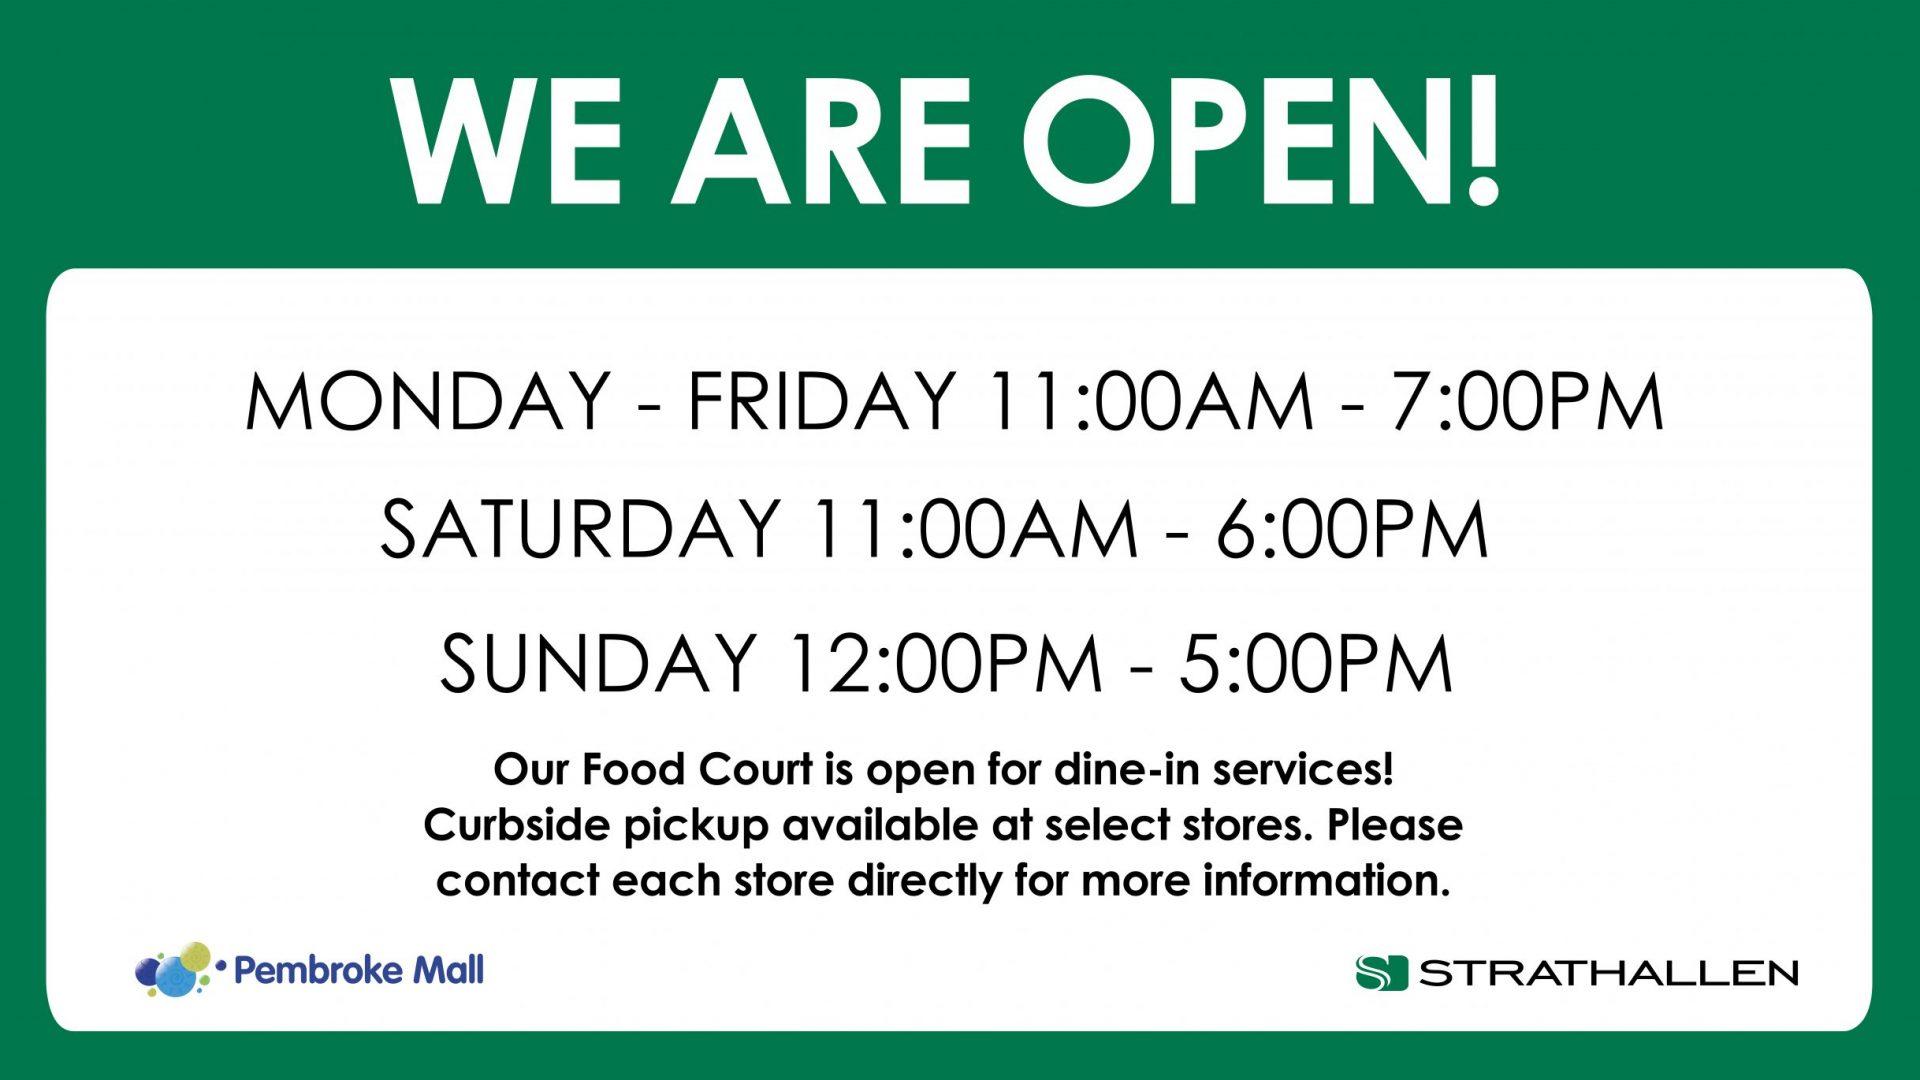 Strathallen Hours - Pembroke Mall